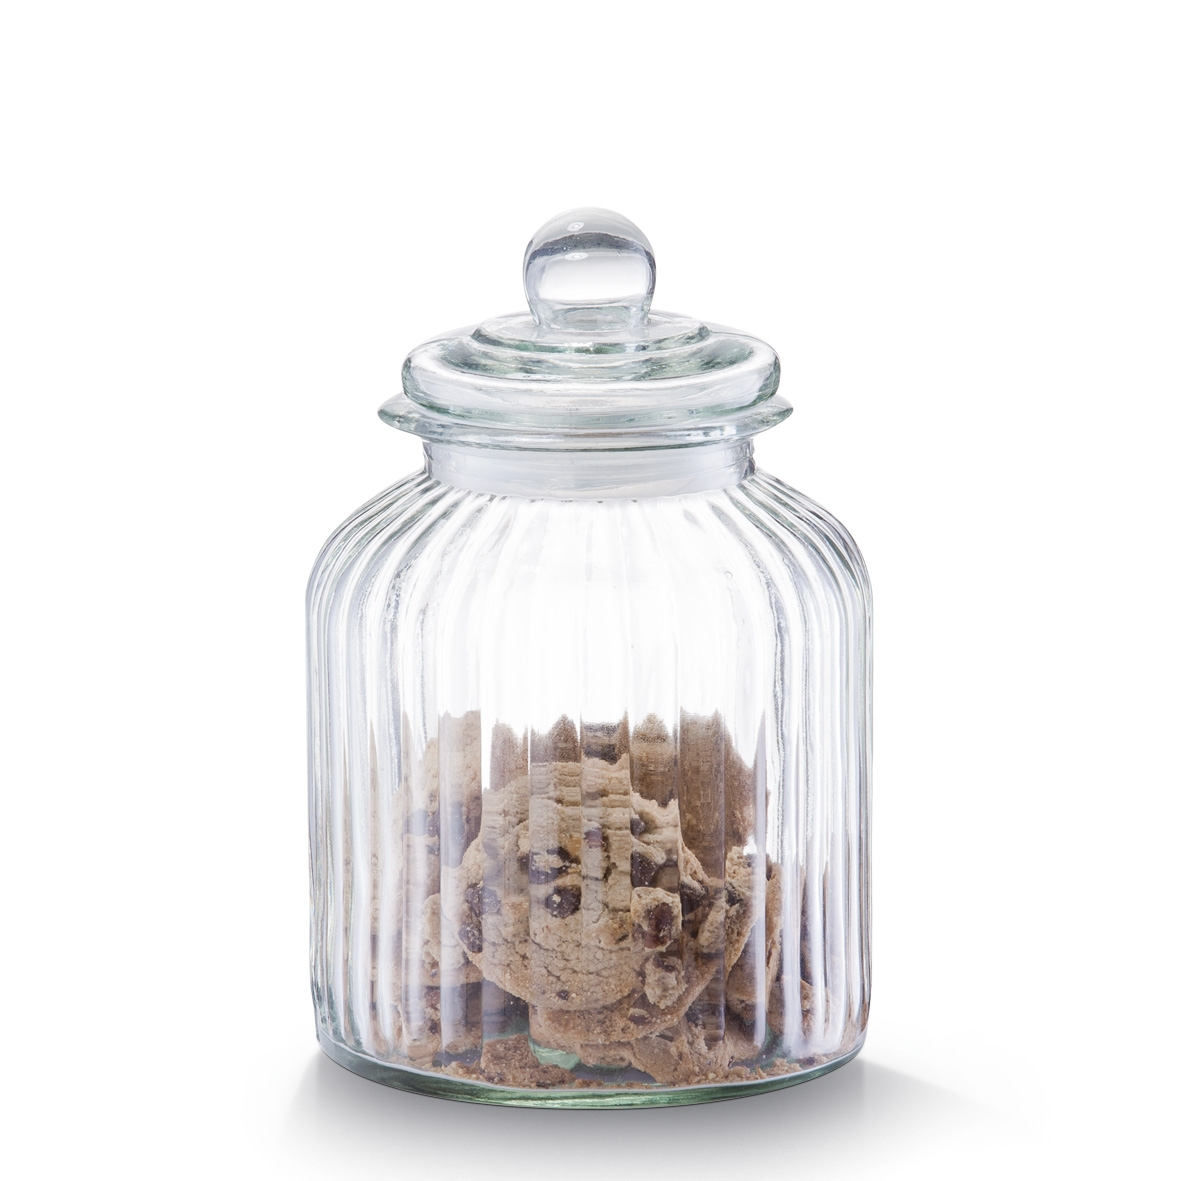 Borcan pentru depozitare din sticla Nostalgia, capac etans, 3800 ml, Ø 17,5xH26 cm imagine